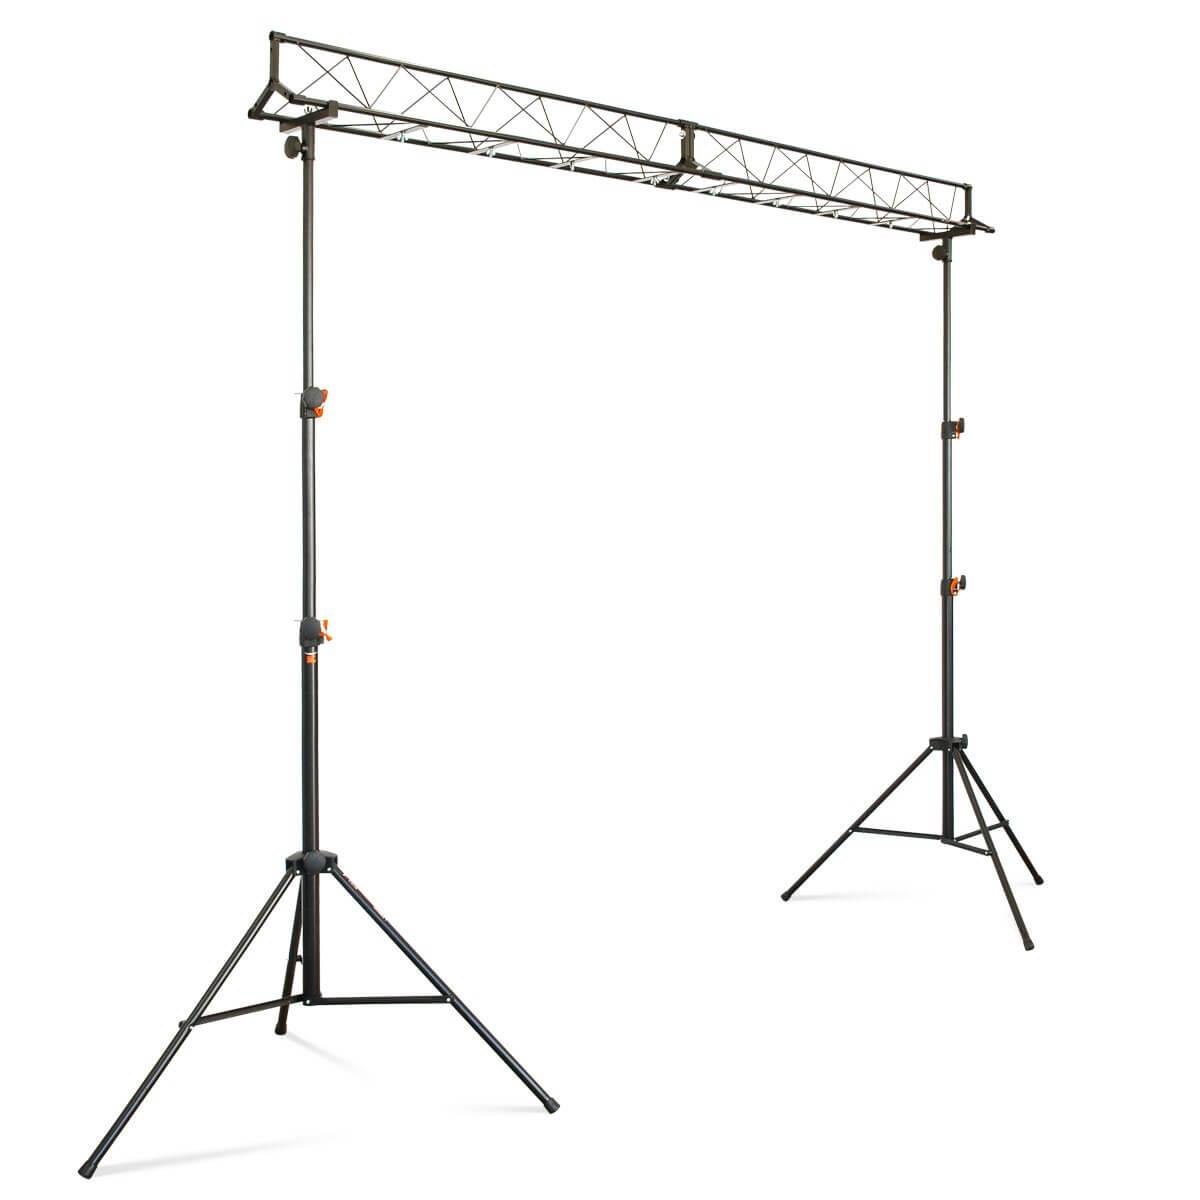 Simply Sound & Lighting R-KIT 3M Lighting Truss Gantry Stand